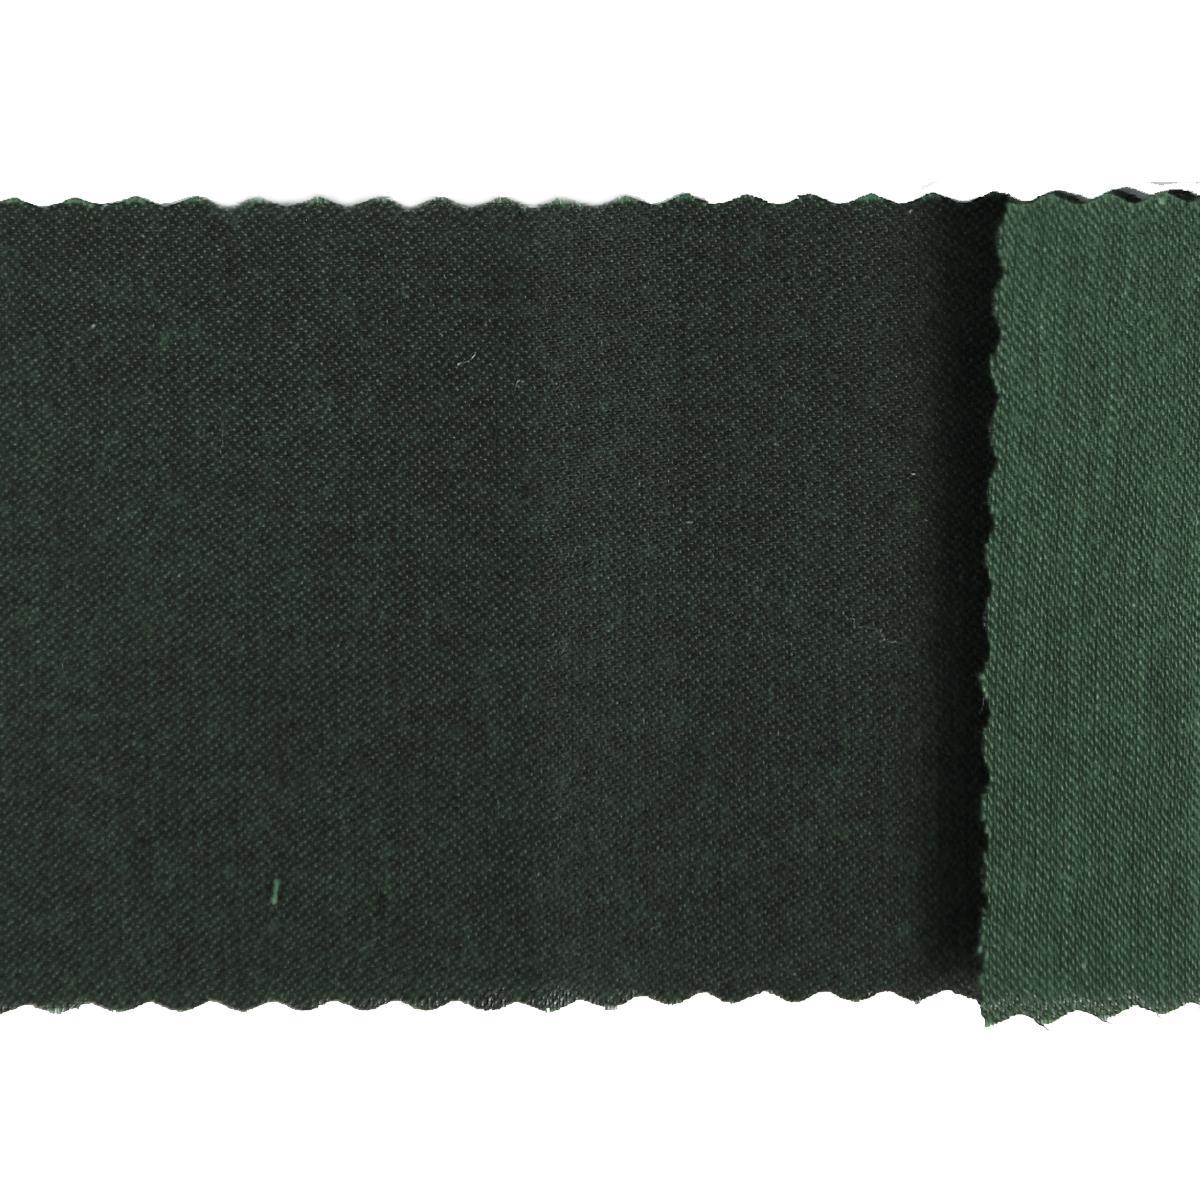 Tela algodón sarga hidrófuga 70 lavados verde